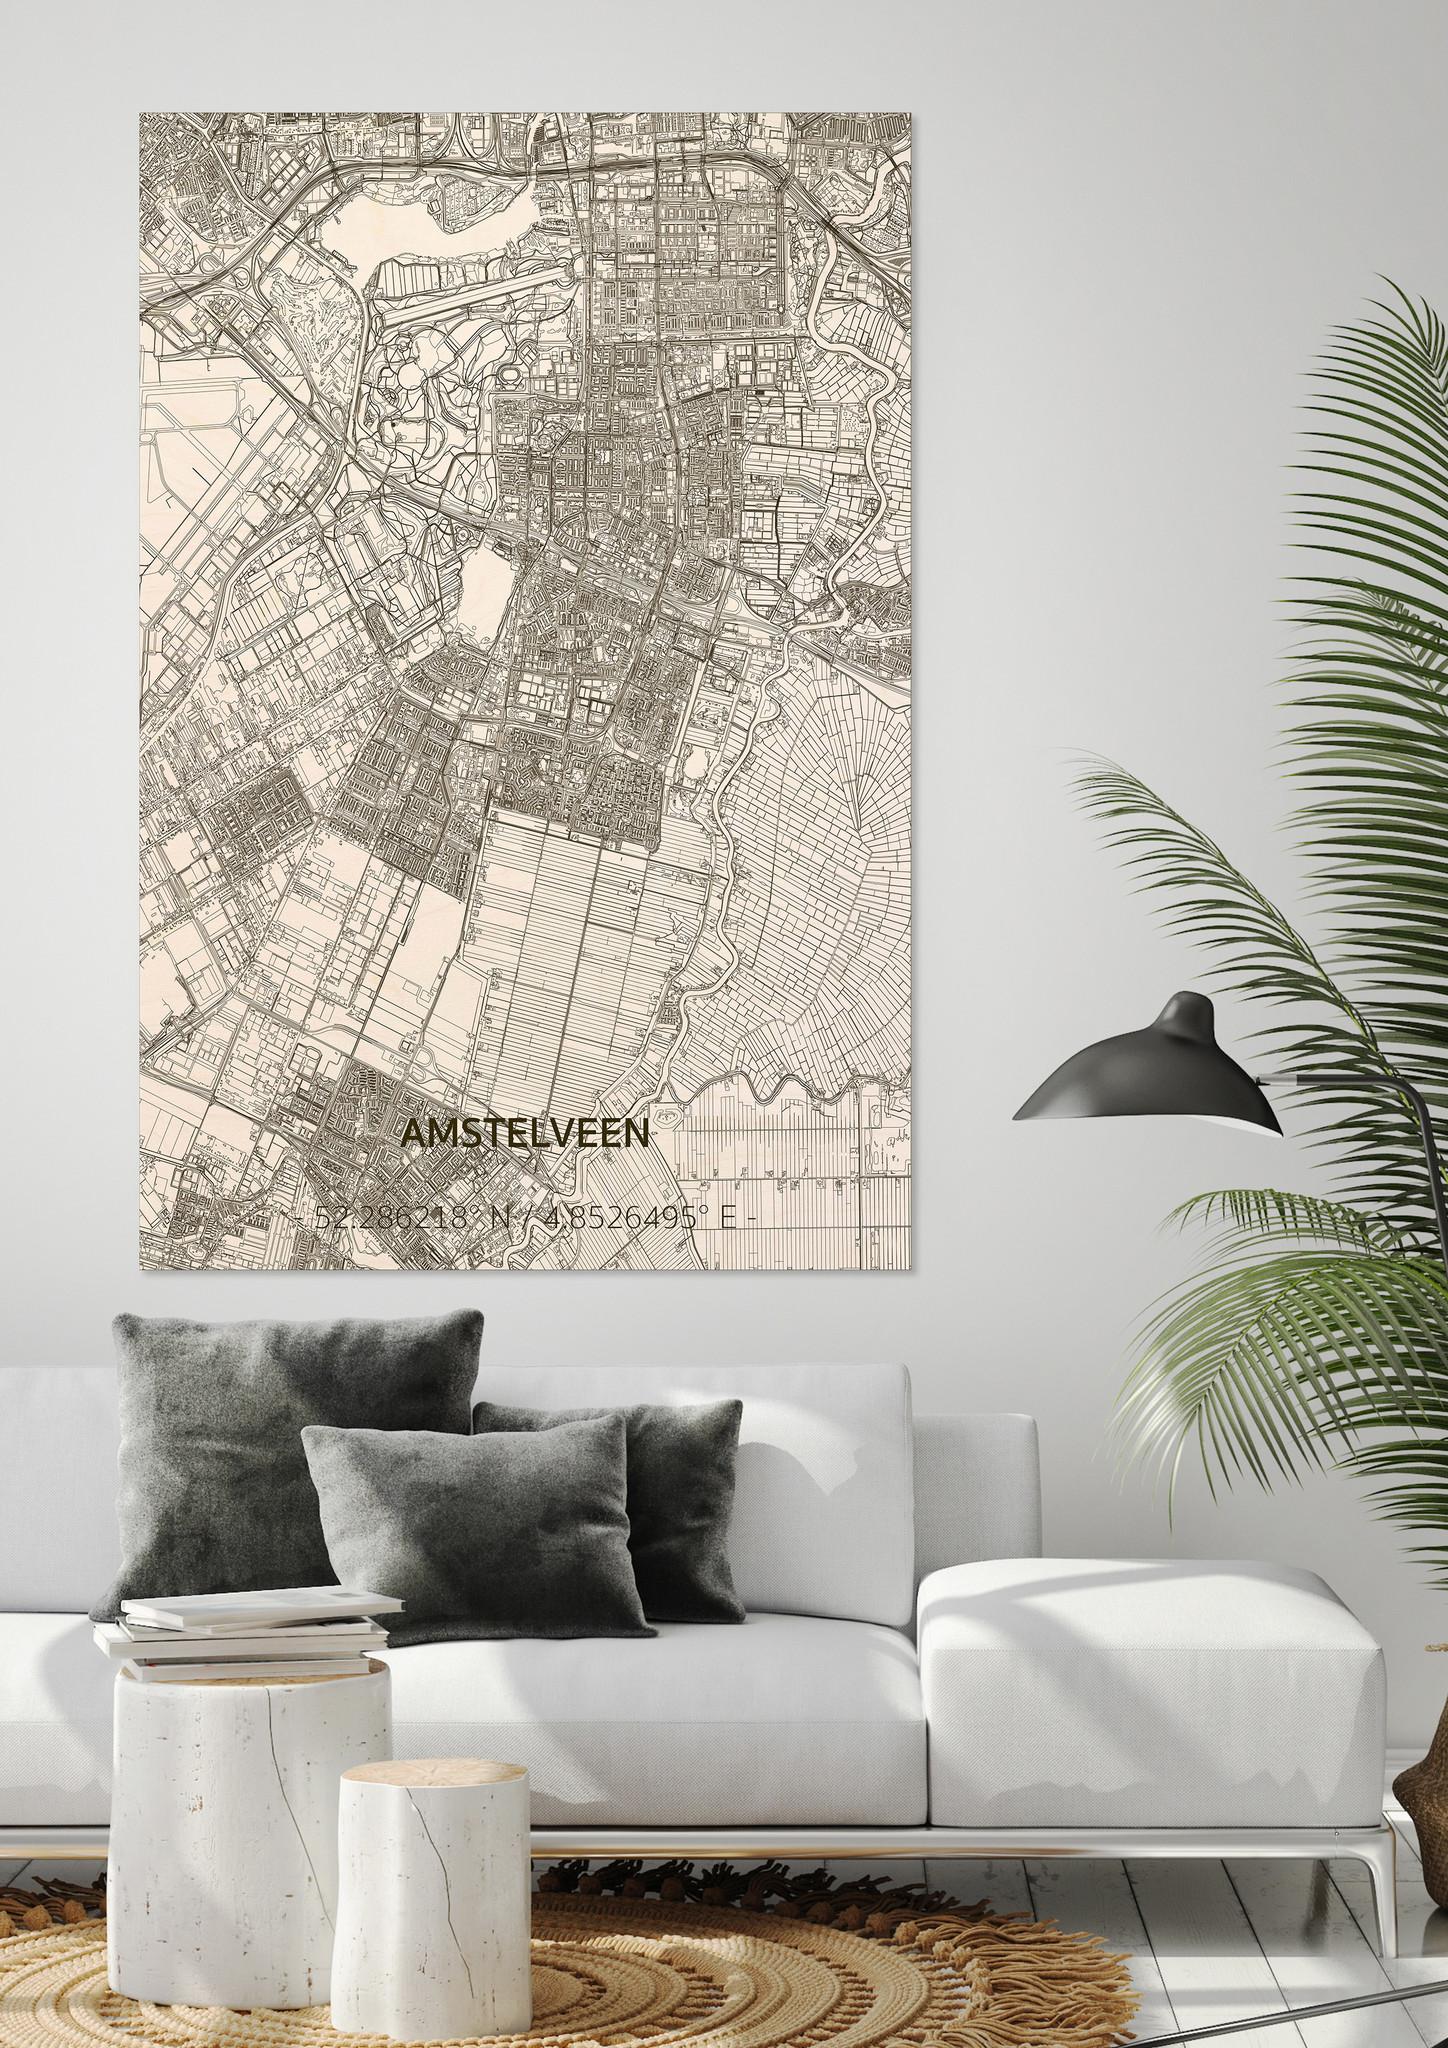 Wooden wall decoration Citymap Amstelveen XL-2